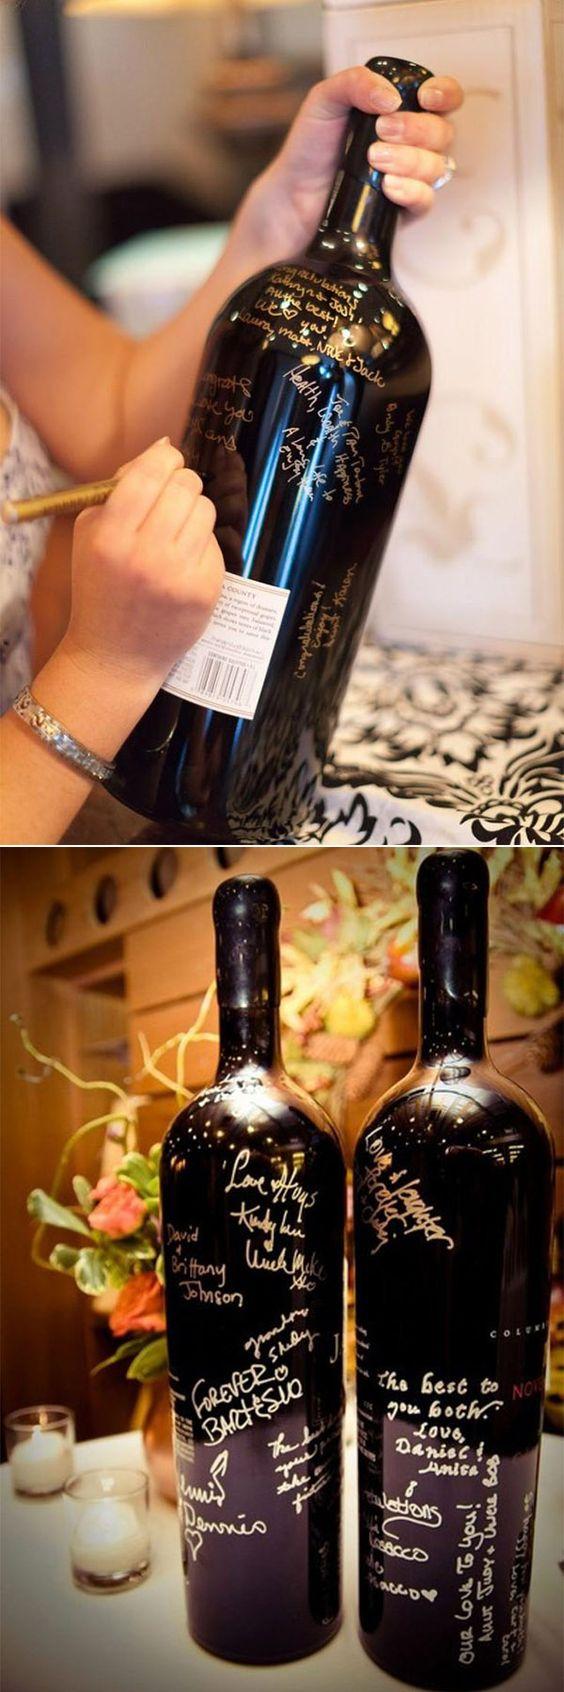 wine bottle wedding guest book ideas